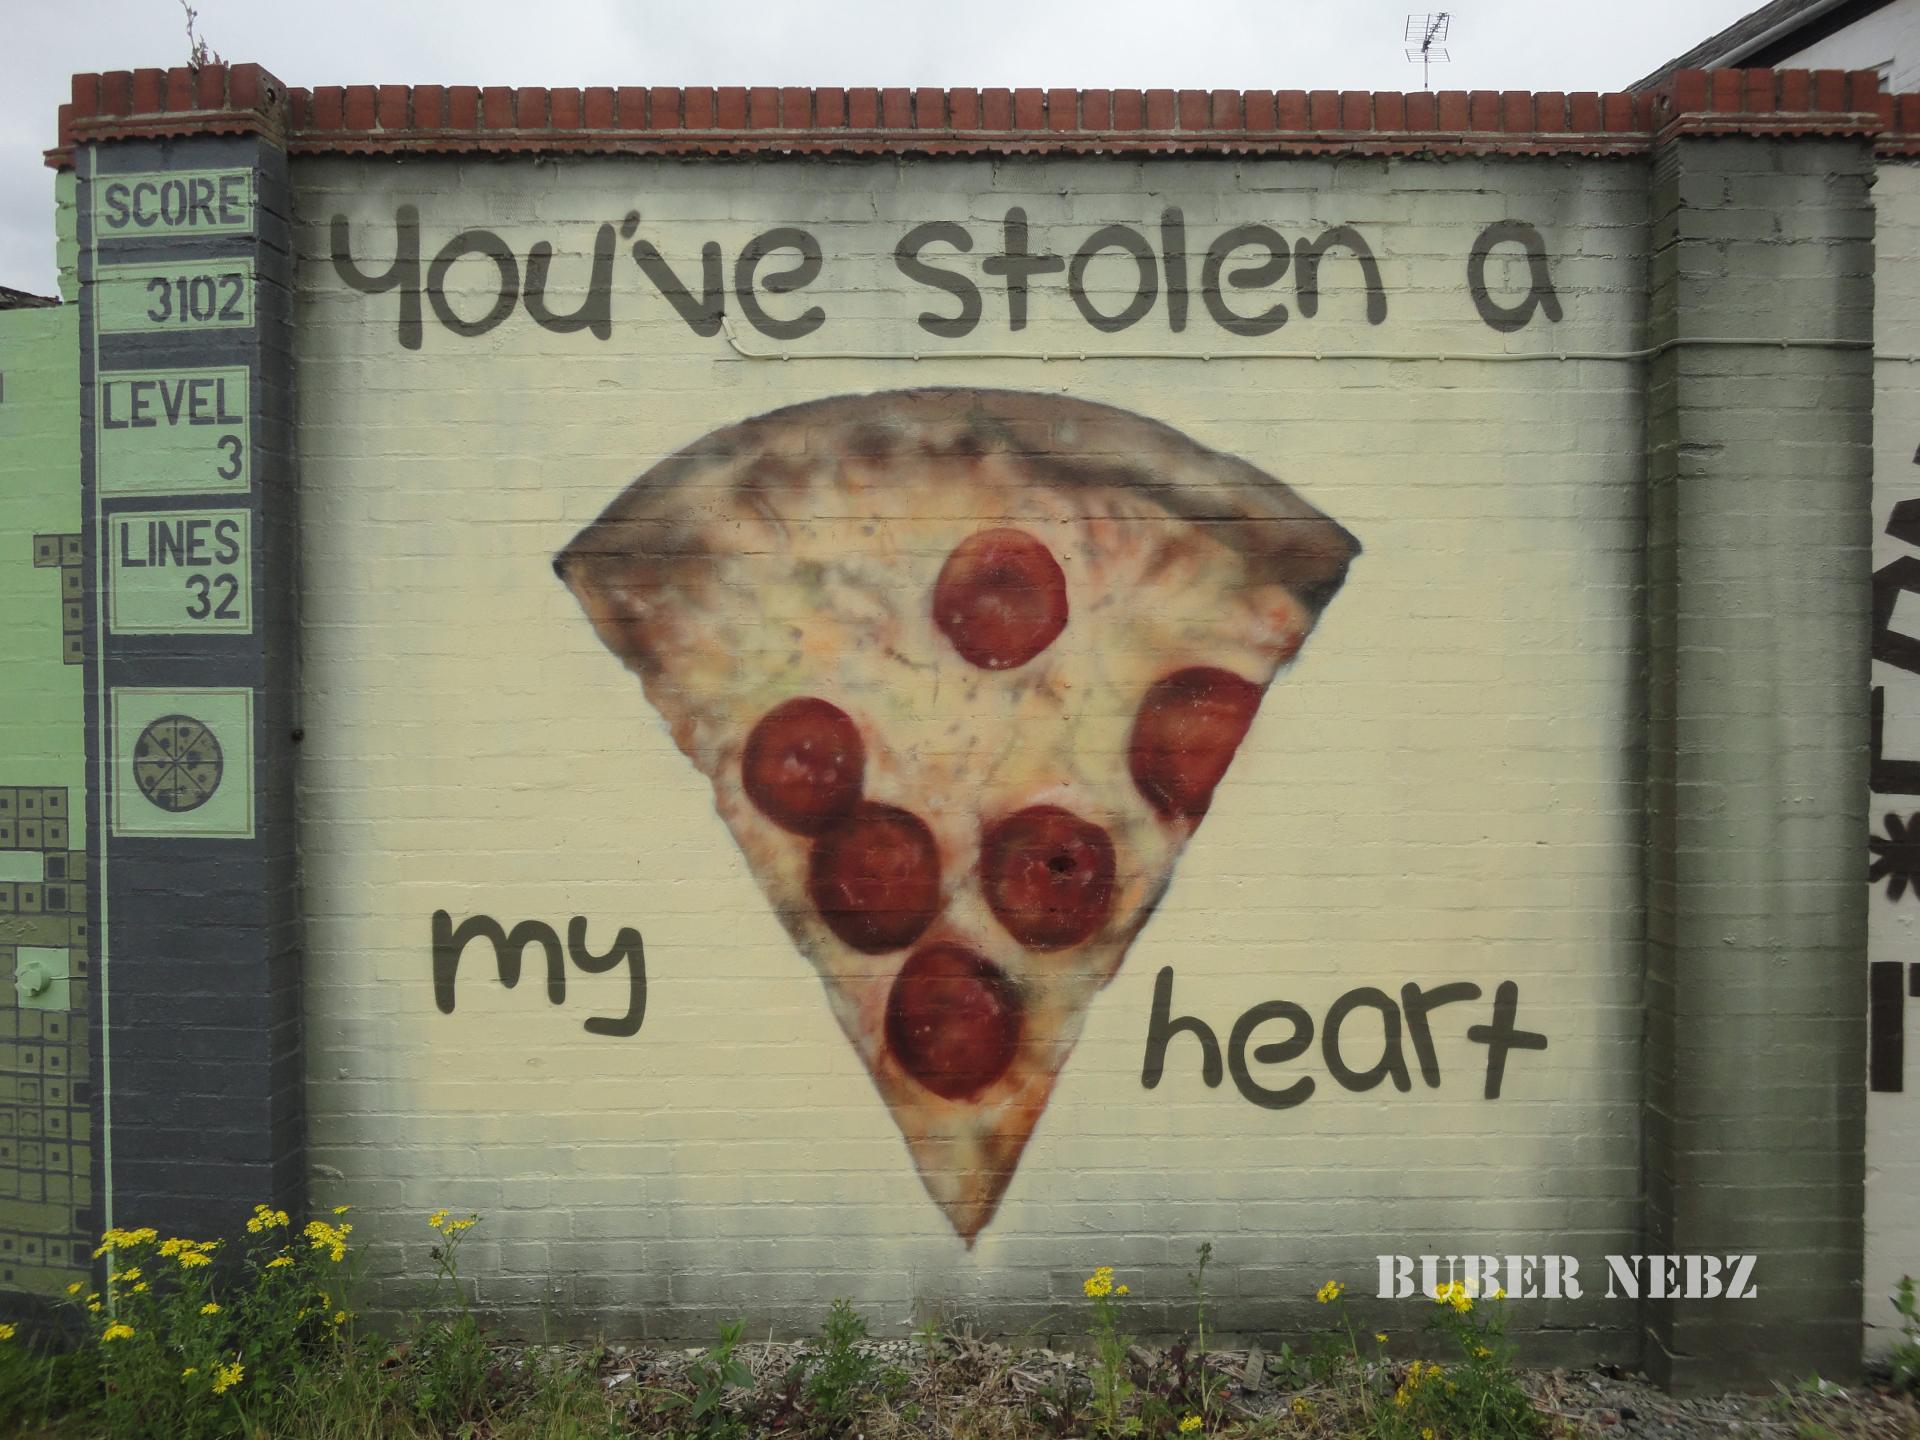 You've Stolen A Pizza My Heart